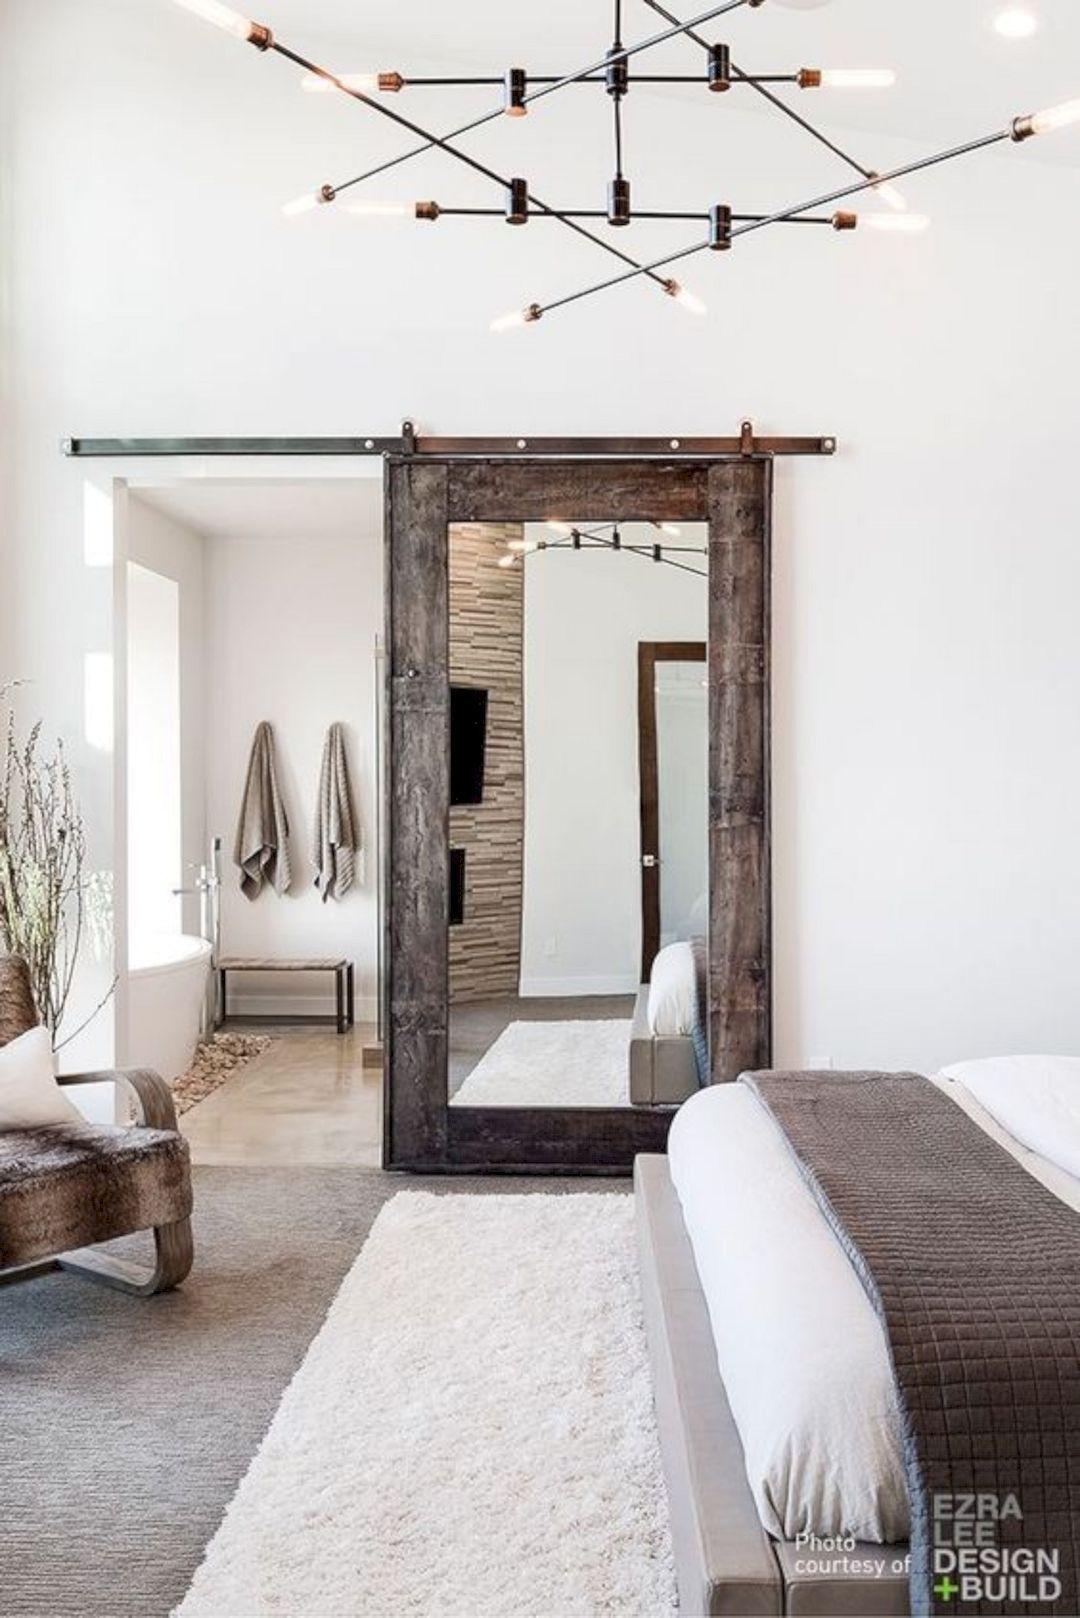 13 Top Brown Furniture Bedroom Ideas | Room decor | Pinterest ... Barn Doors Interior House Designs Html on wood interior house design, white interior house design, barn doors interior design ideas,